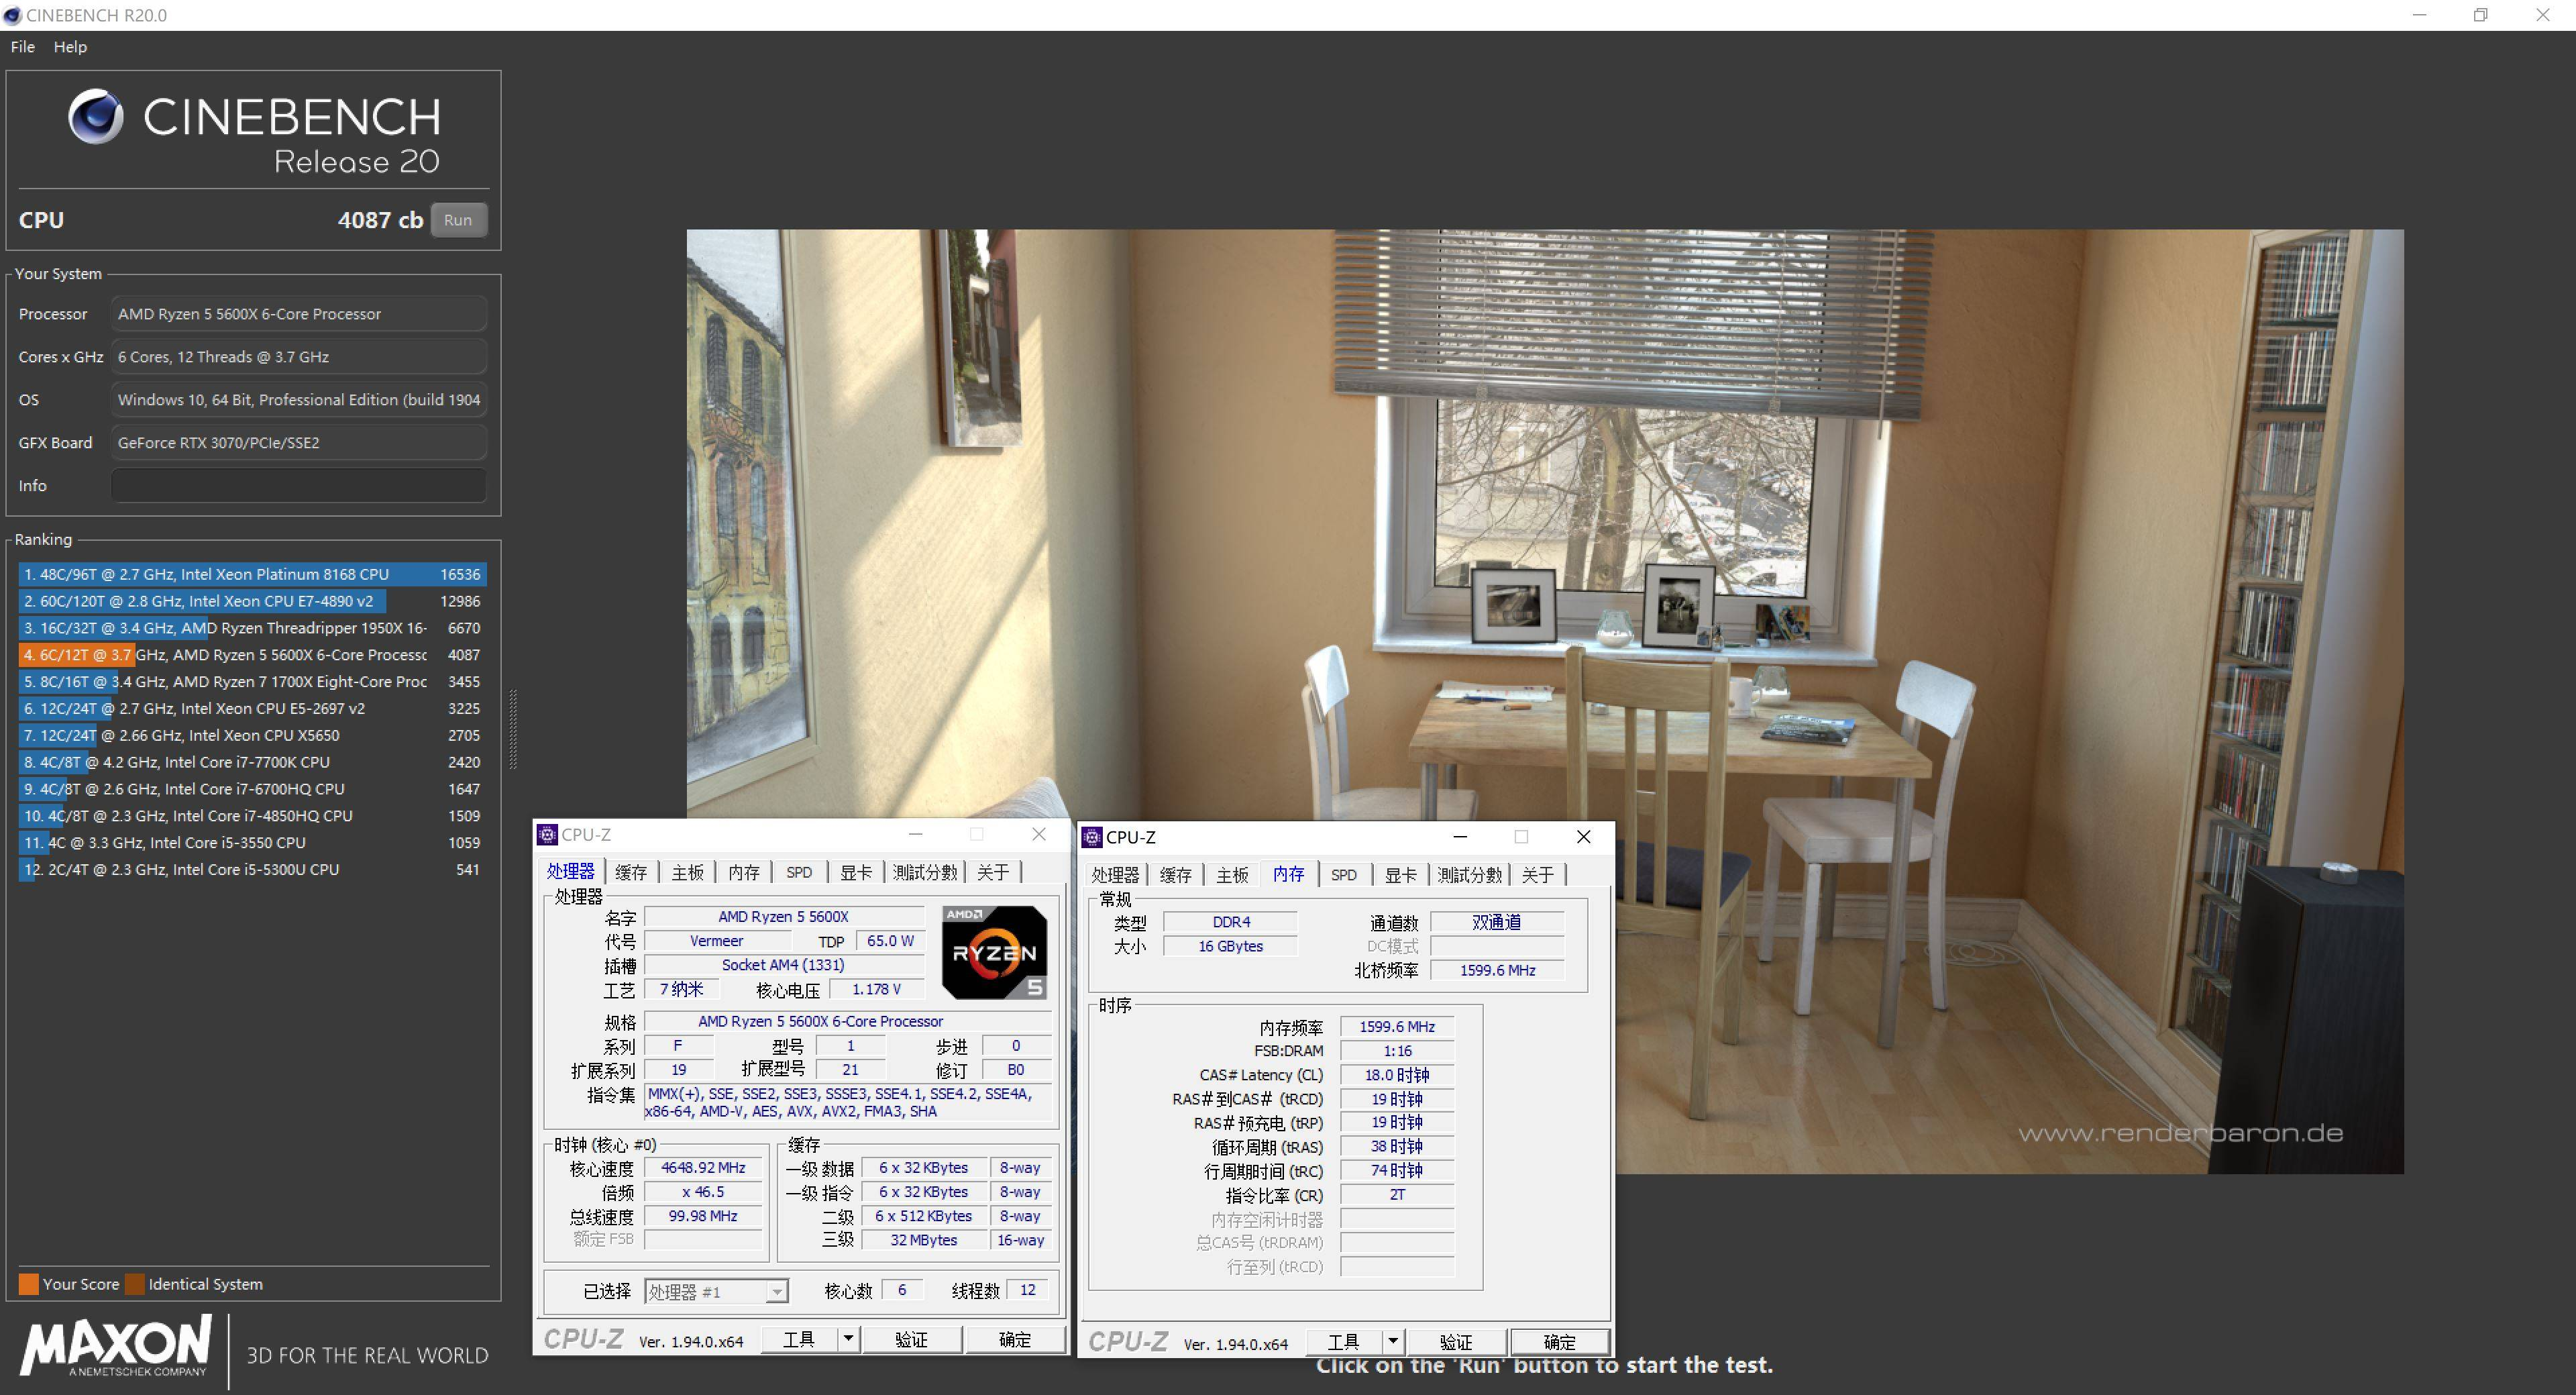 led49-55m5600uc维修手册.pdf -max上传文档投稿赚钱-文档C2C...